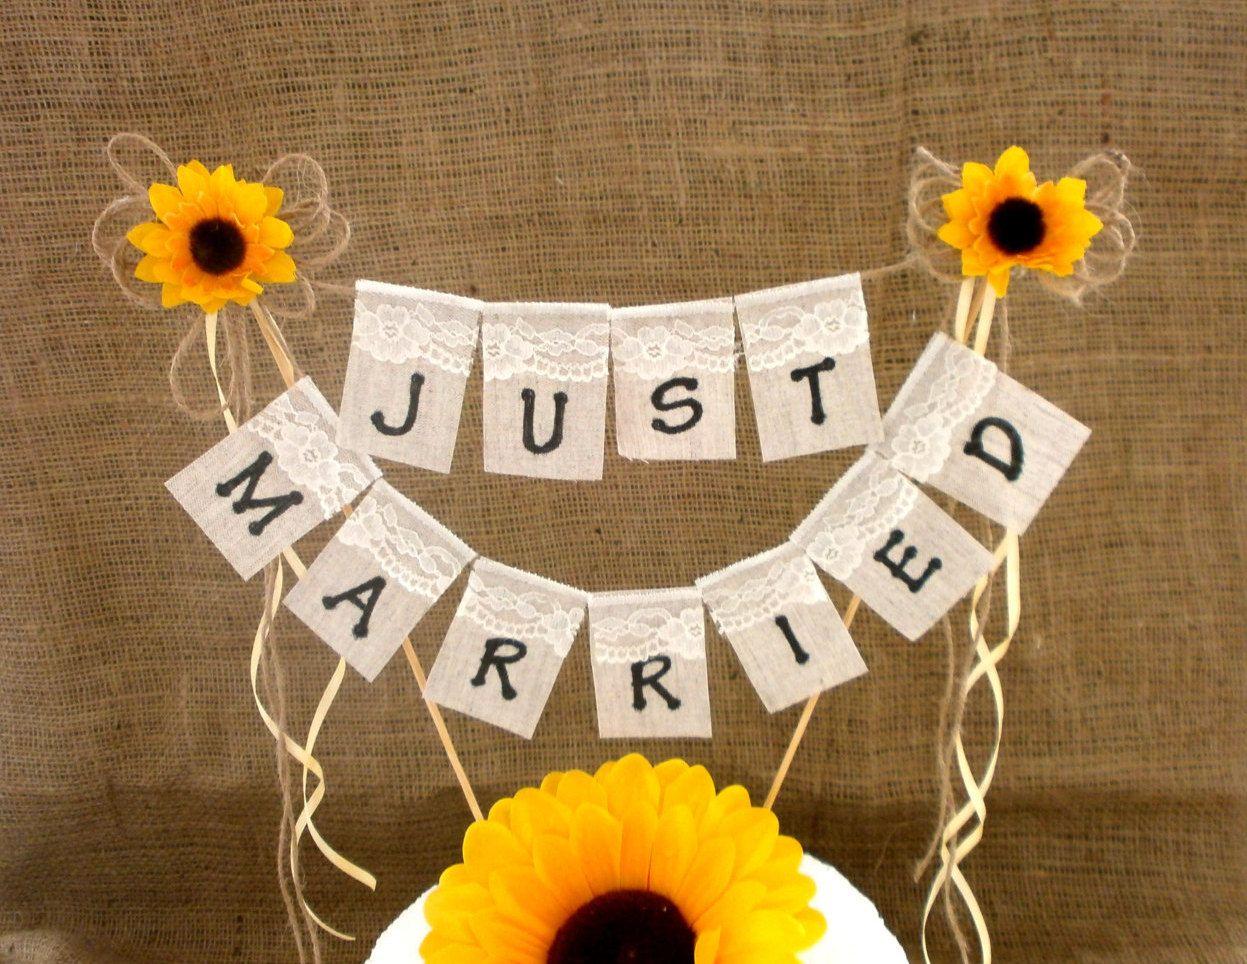 50 sunflowerinspired wedding ideas country wedding